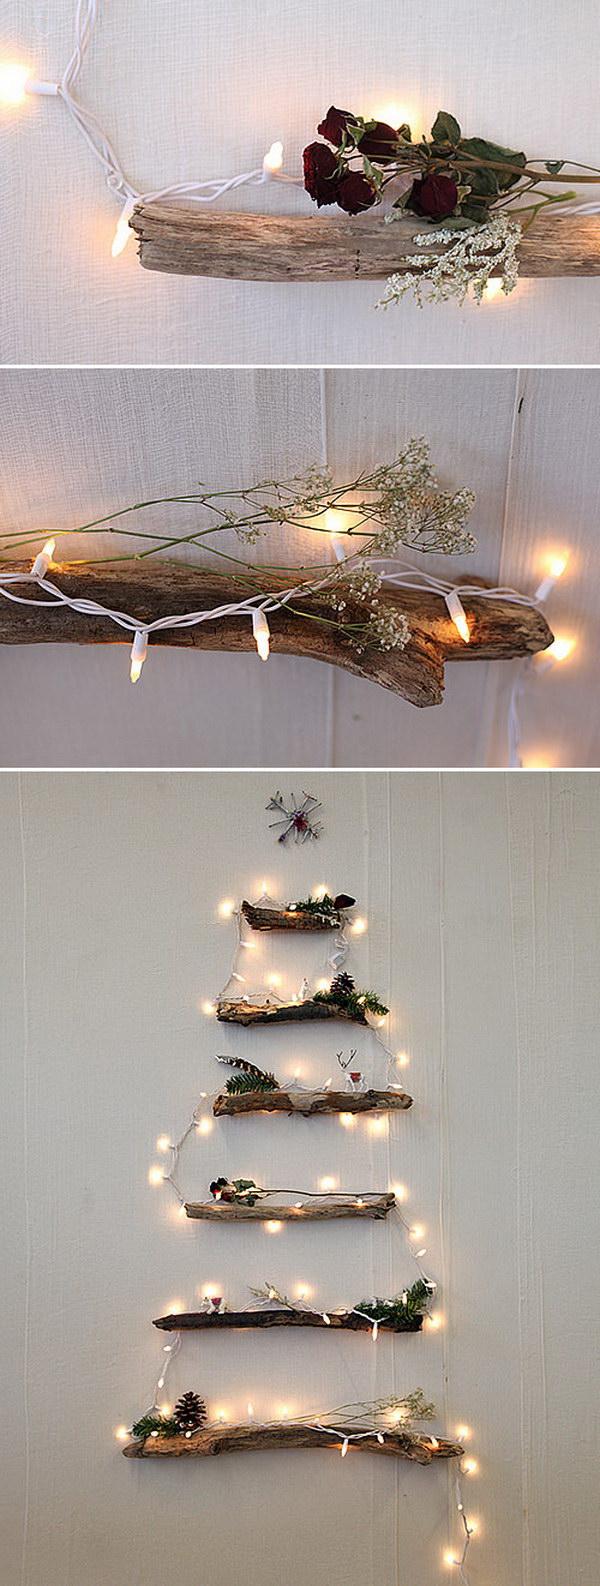 DIY Alternative Christmas Tree.